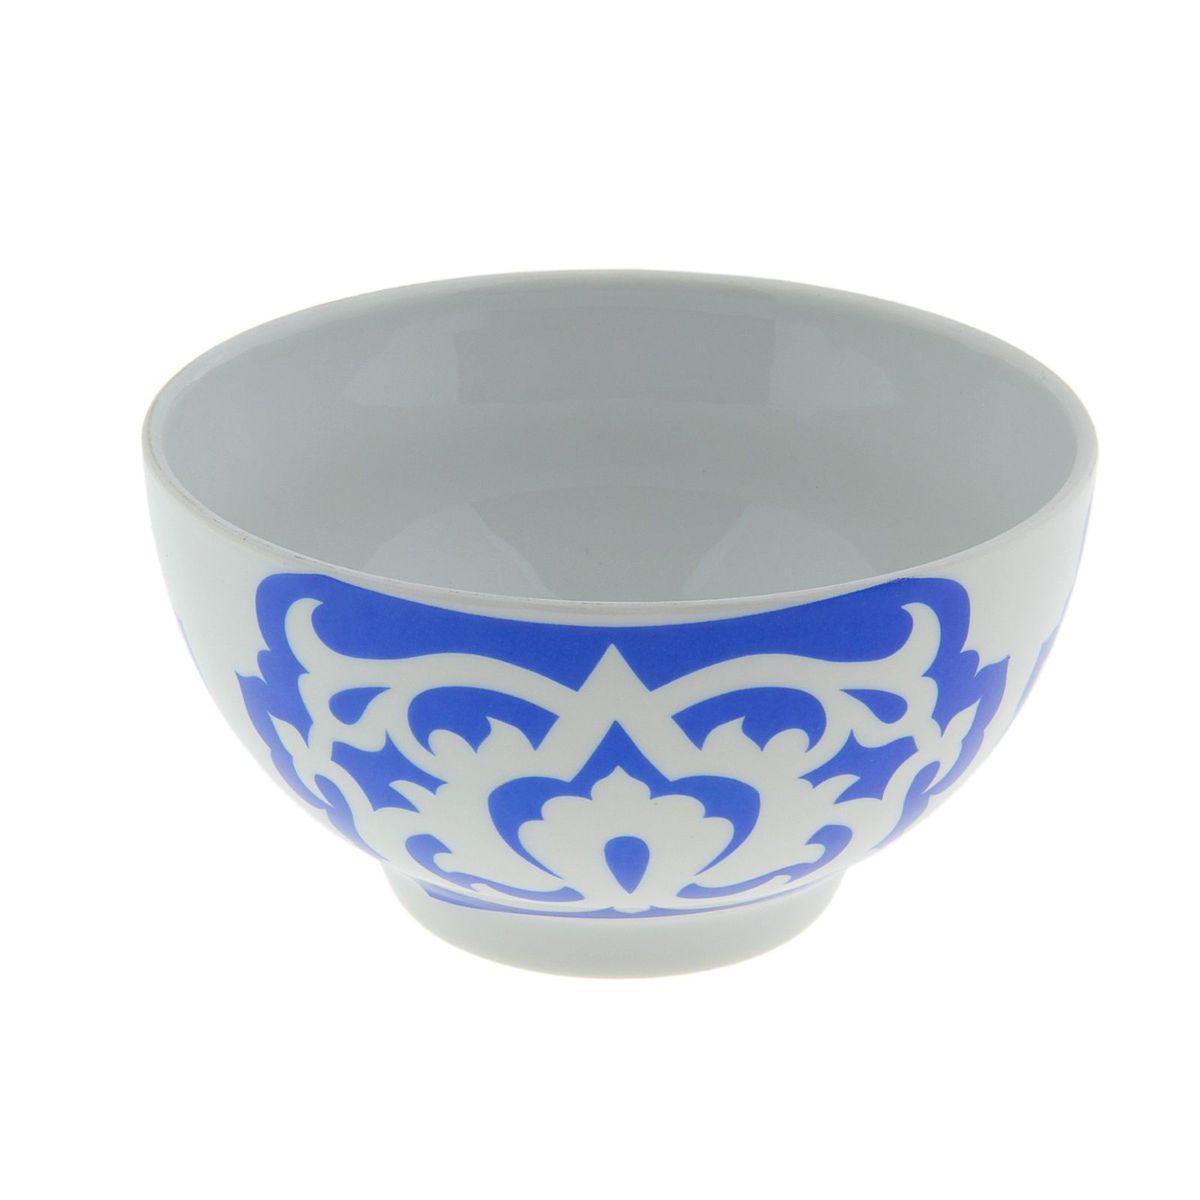 Пиала Азия, цвет: синий, 500 мл508033